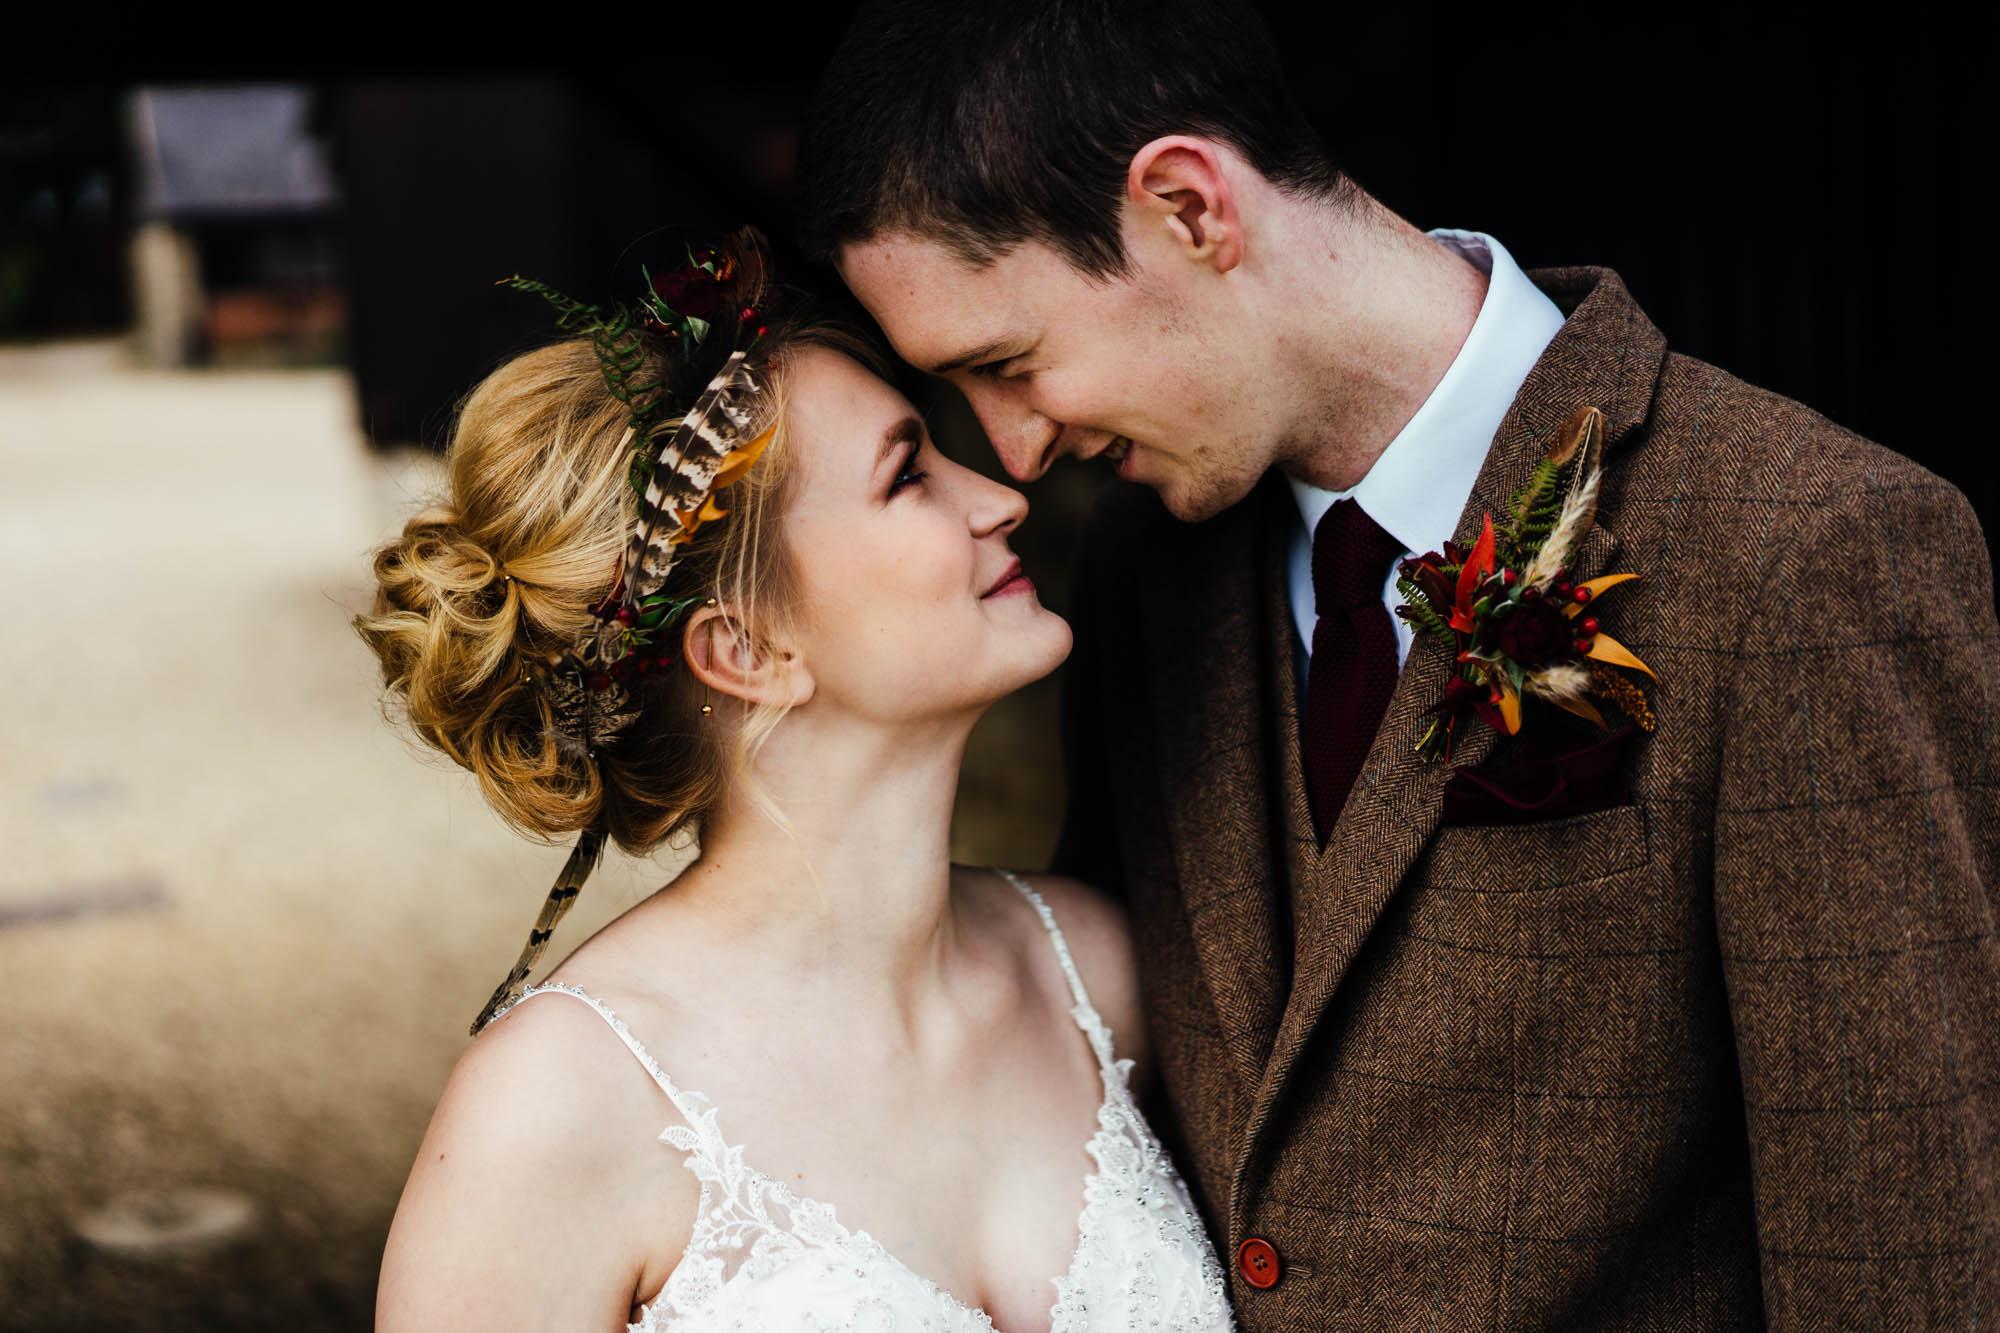 huntsmill-farm-wedding-inspiration-21